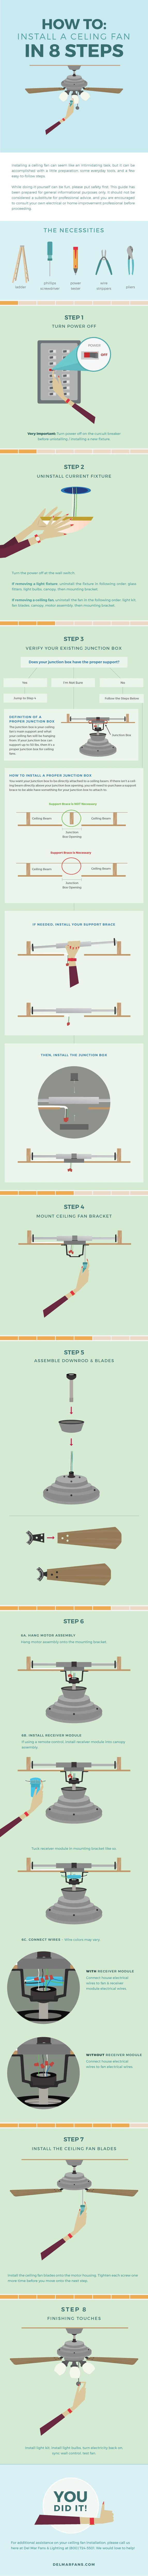 How To Install a Ceiling Fan | Del Mar Fans & Lighting